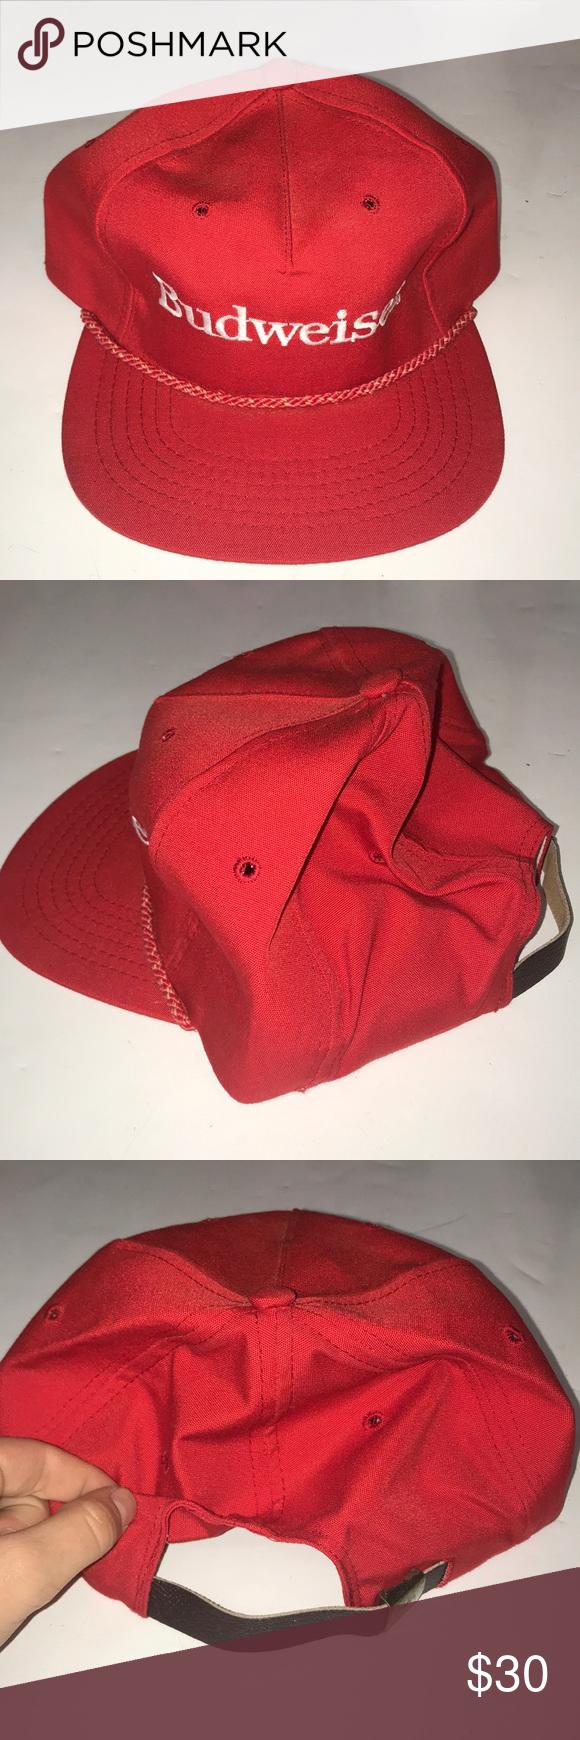 Men S Budweiser Vintage Hat Deadstock Hats Vintage Deadstock Hats